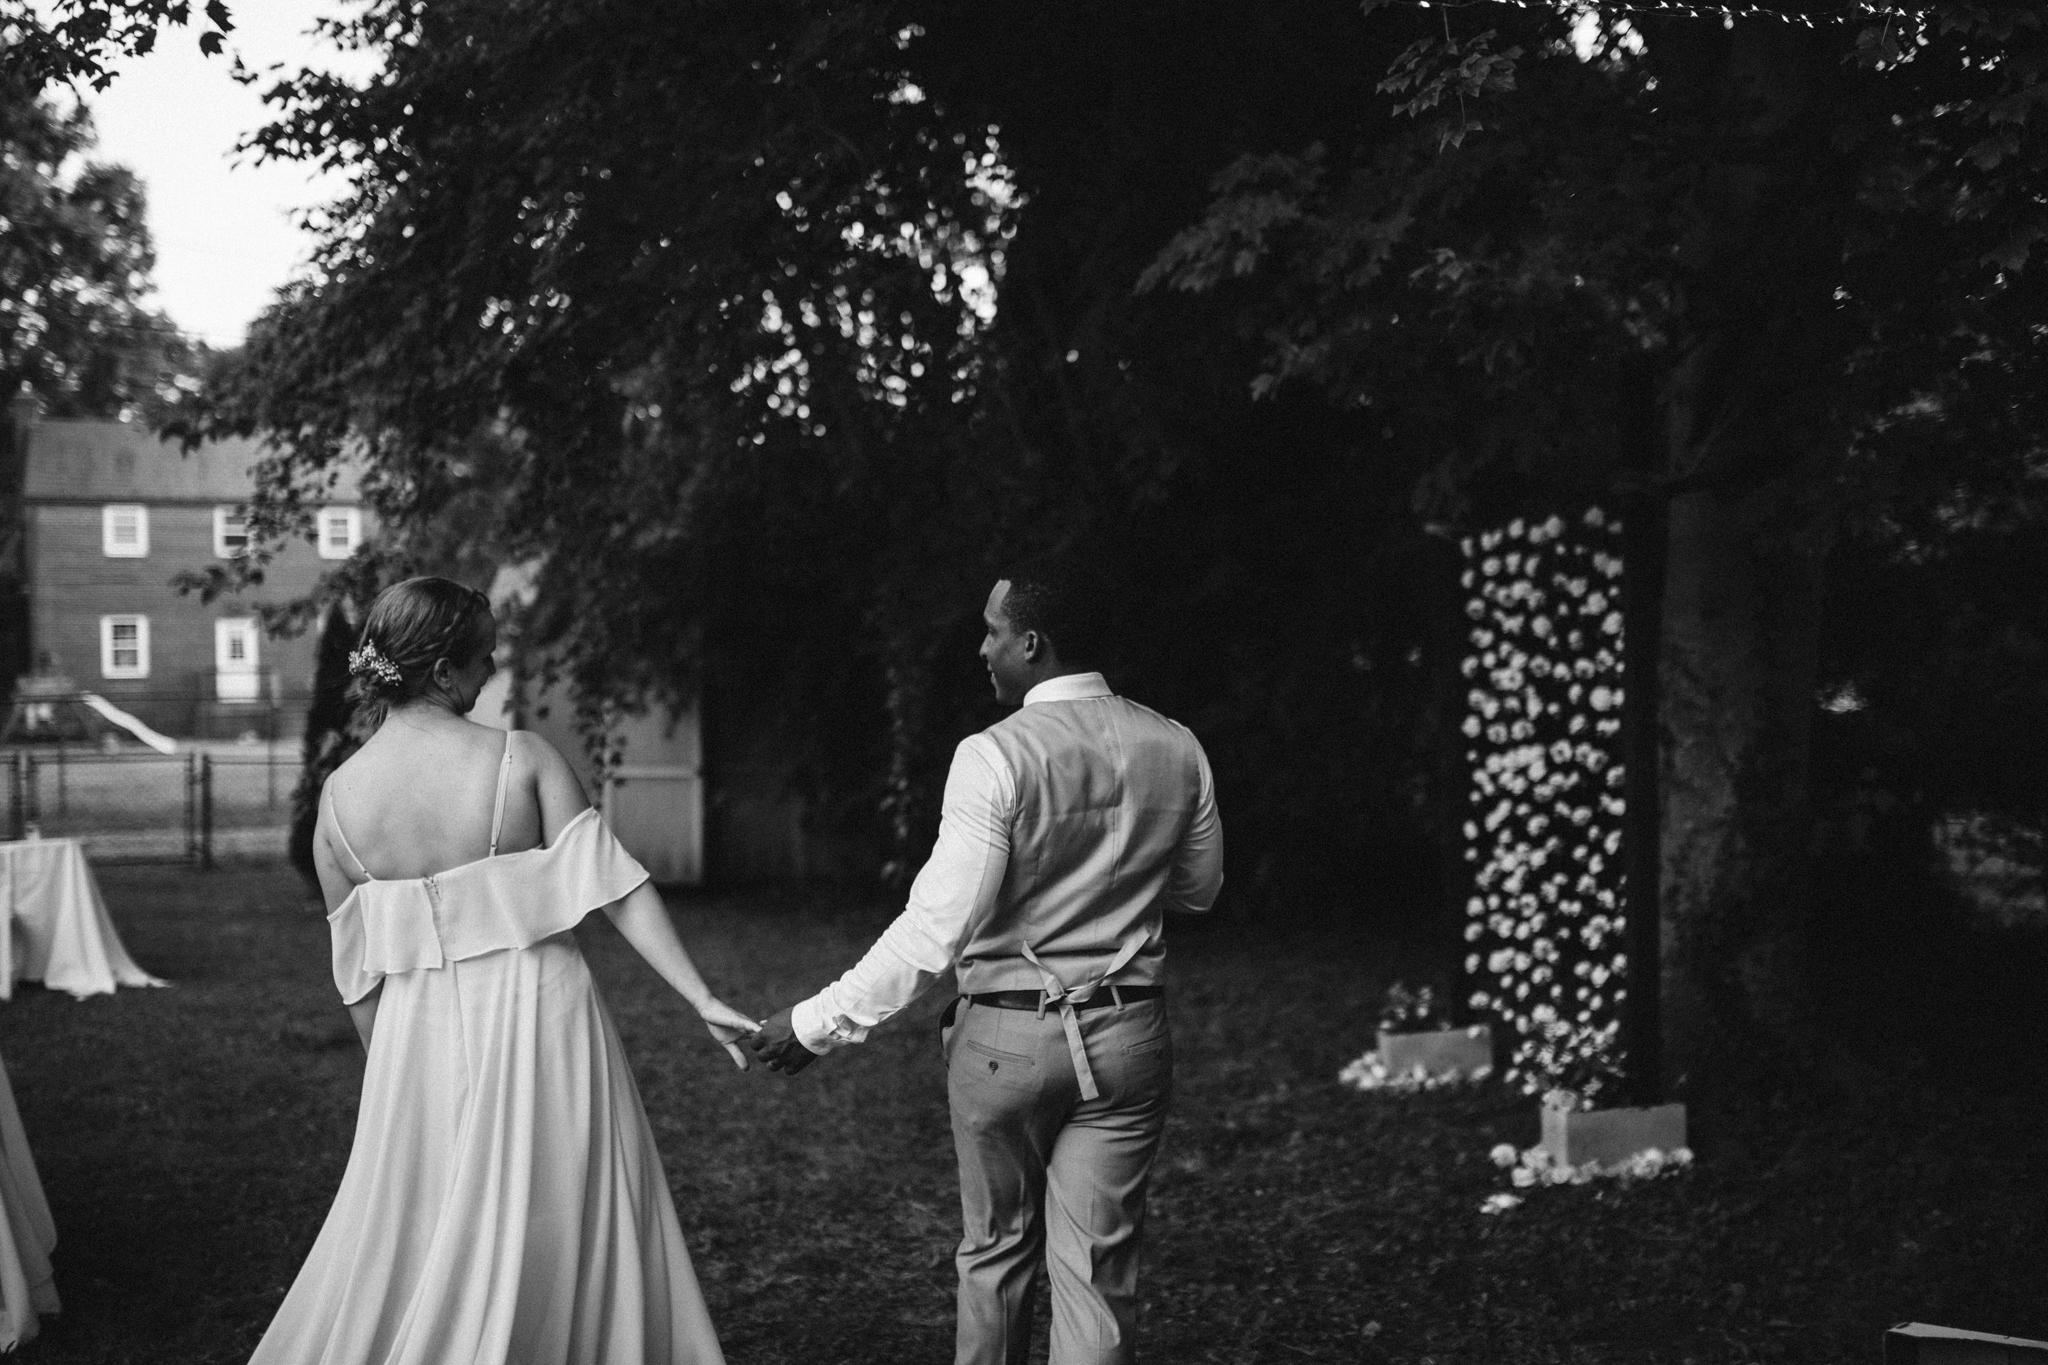 dorota_dwight_richmond_backyard_wedding-91.jpg